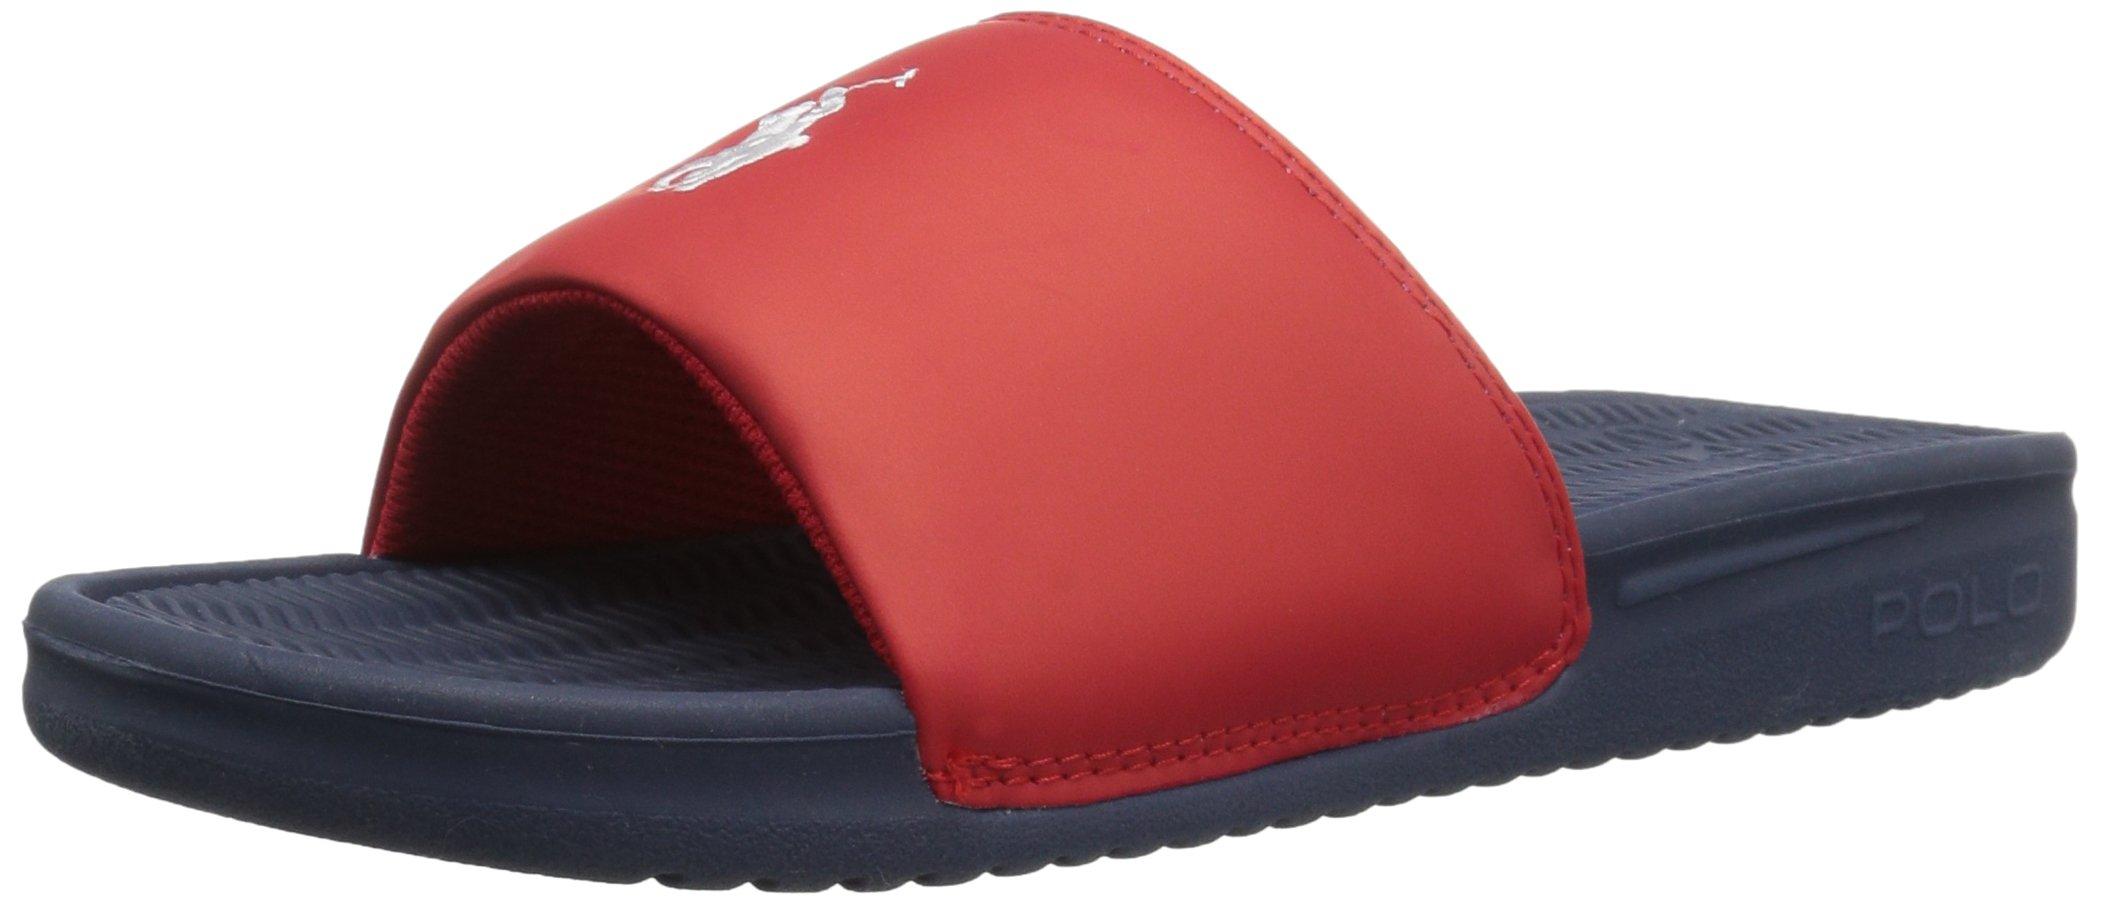 Polo Ralph Lauren Kids REMI Slide NVY/RED Band/WHT PP Sandal, Navy, 6 C US Big Kid